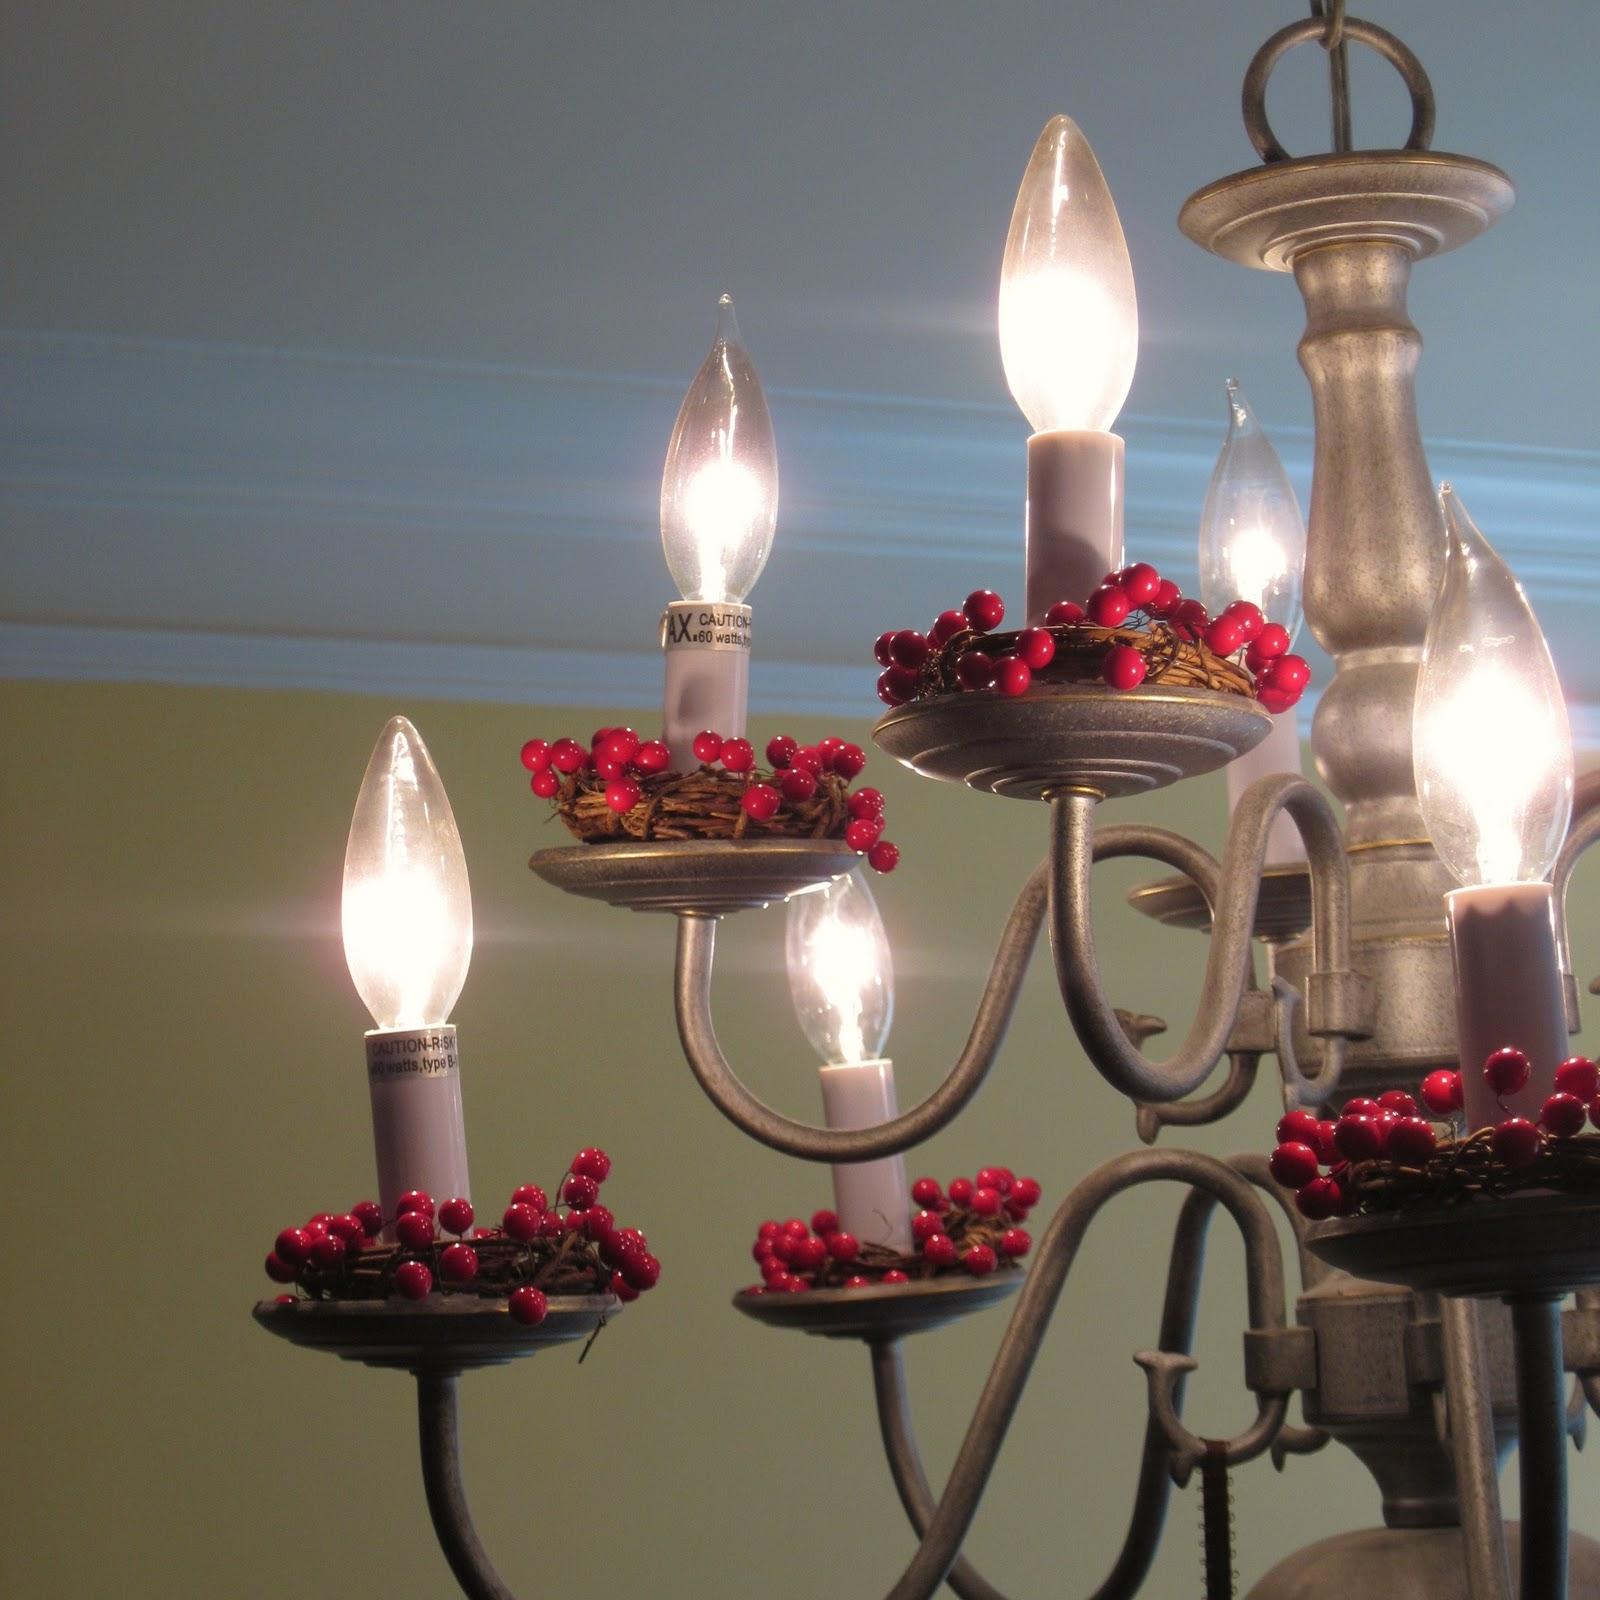 Shamble Ramble Diy Chandelier Cranberry Candle Wreaths